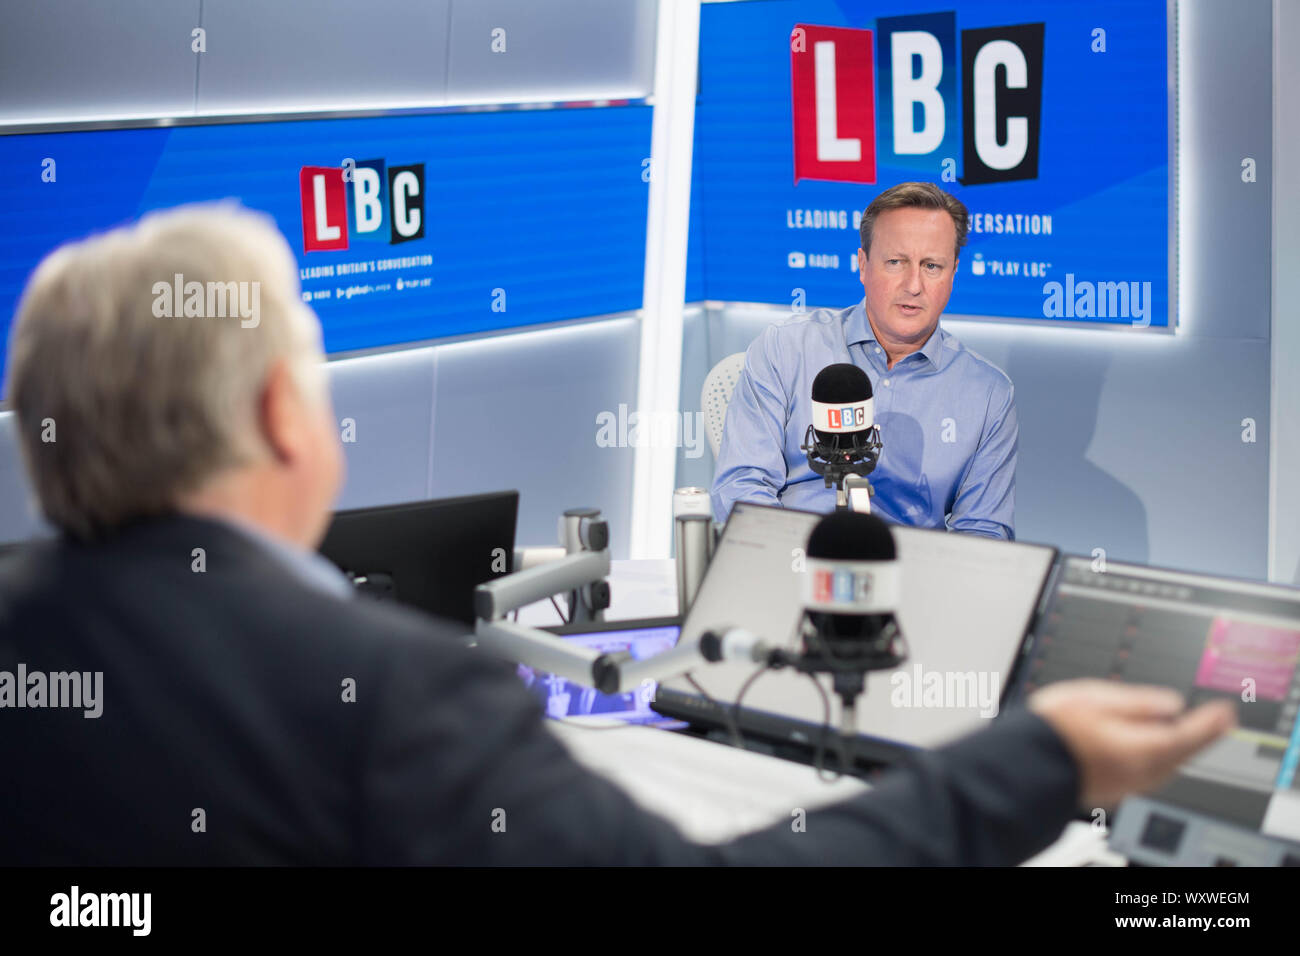 Lbc Radio Presenter Stock Photos & Lbc Radio Presenter Stock